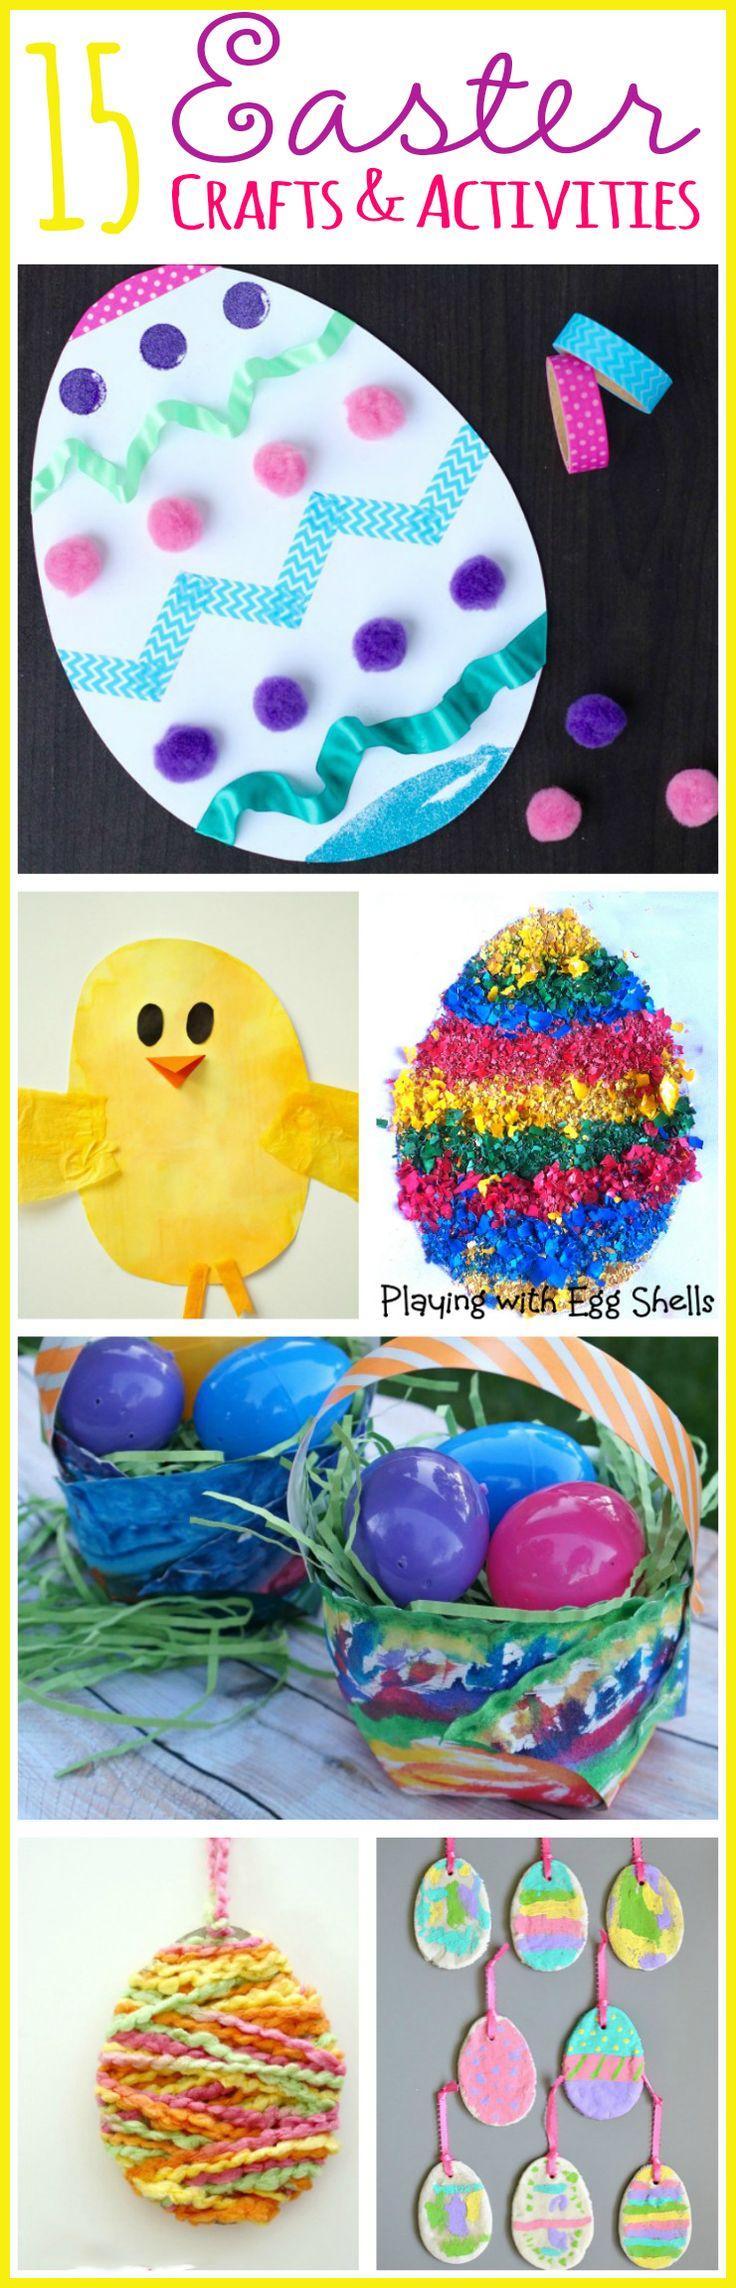 15 Fun & Easy Easter Crafts & Activities